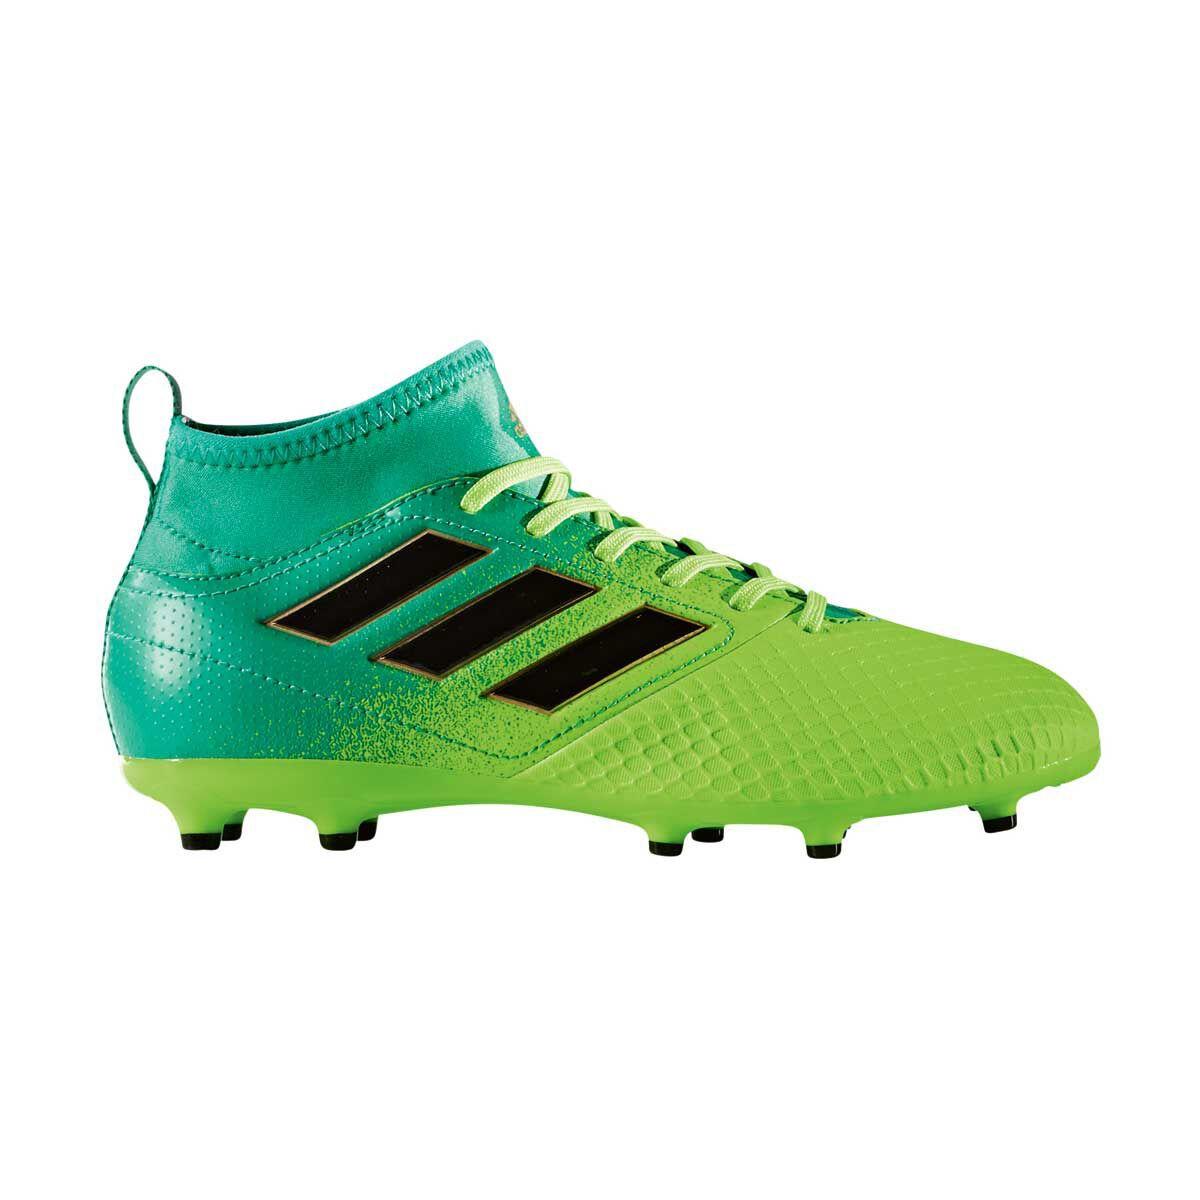 ad7ac90c43b6 ... sale adidas ace 17.3 junior football boots green black us 1 junior  green black 9fbf2 18070